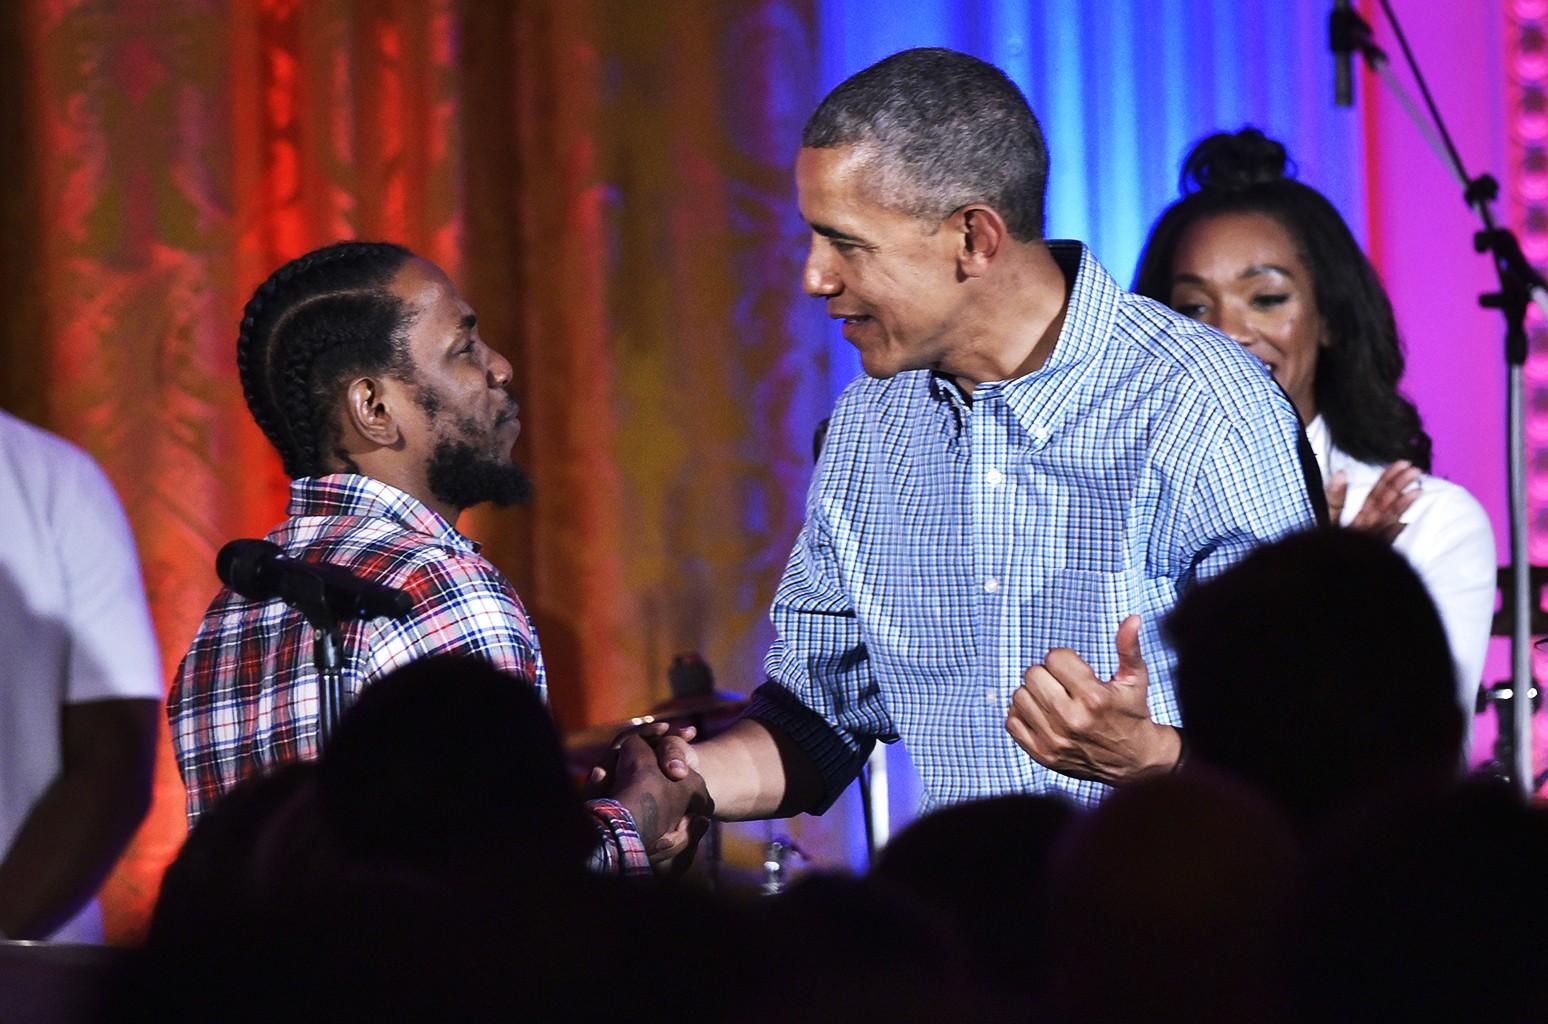 Barack Obama and Kendrick Lamar